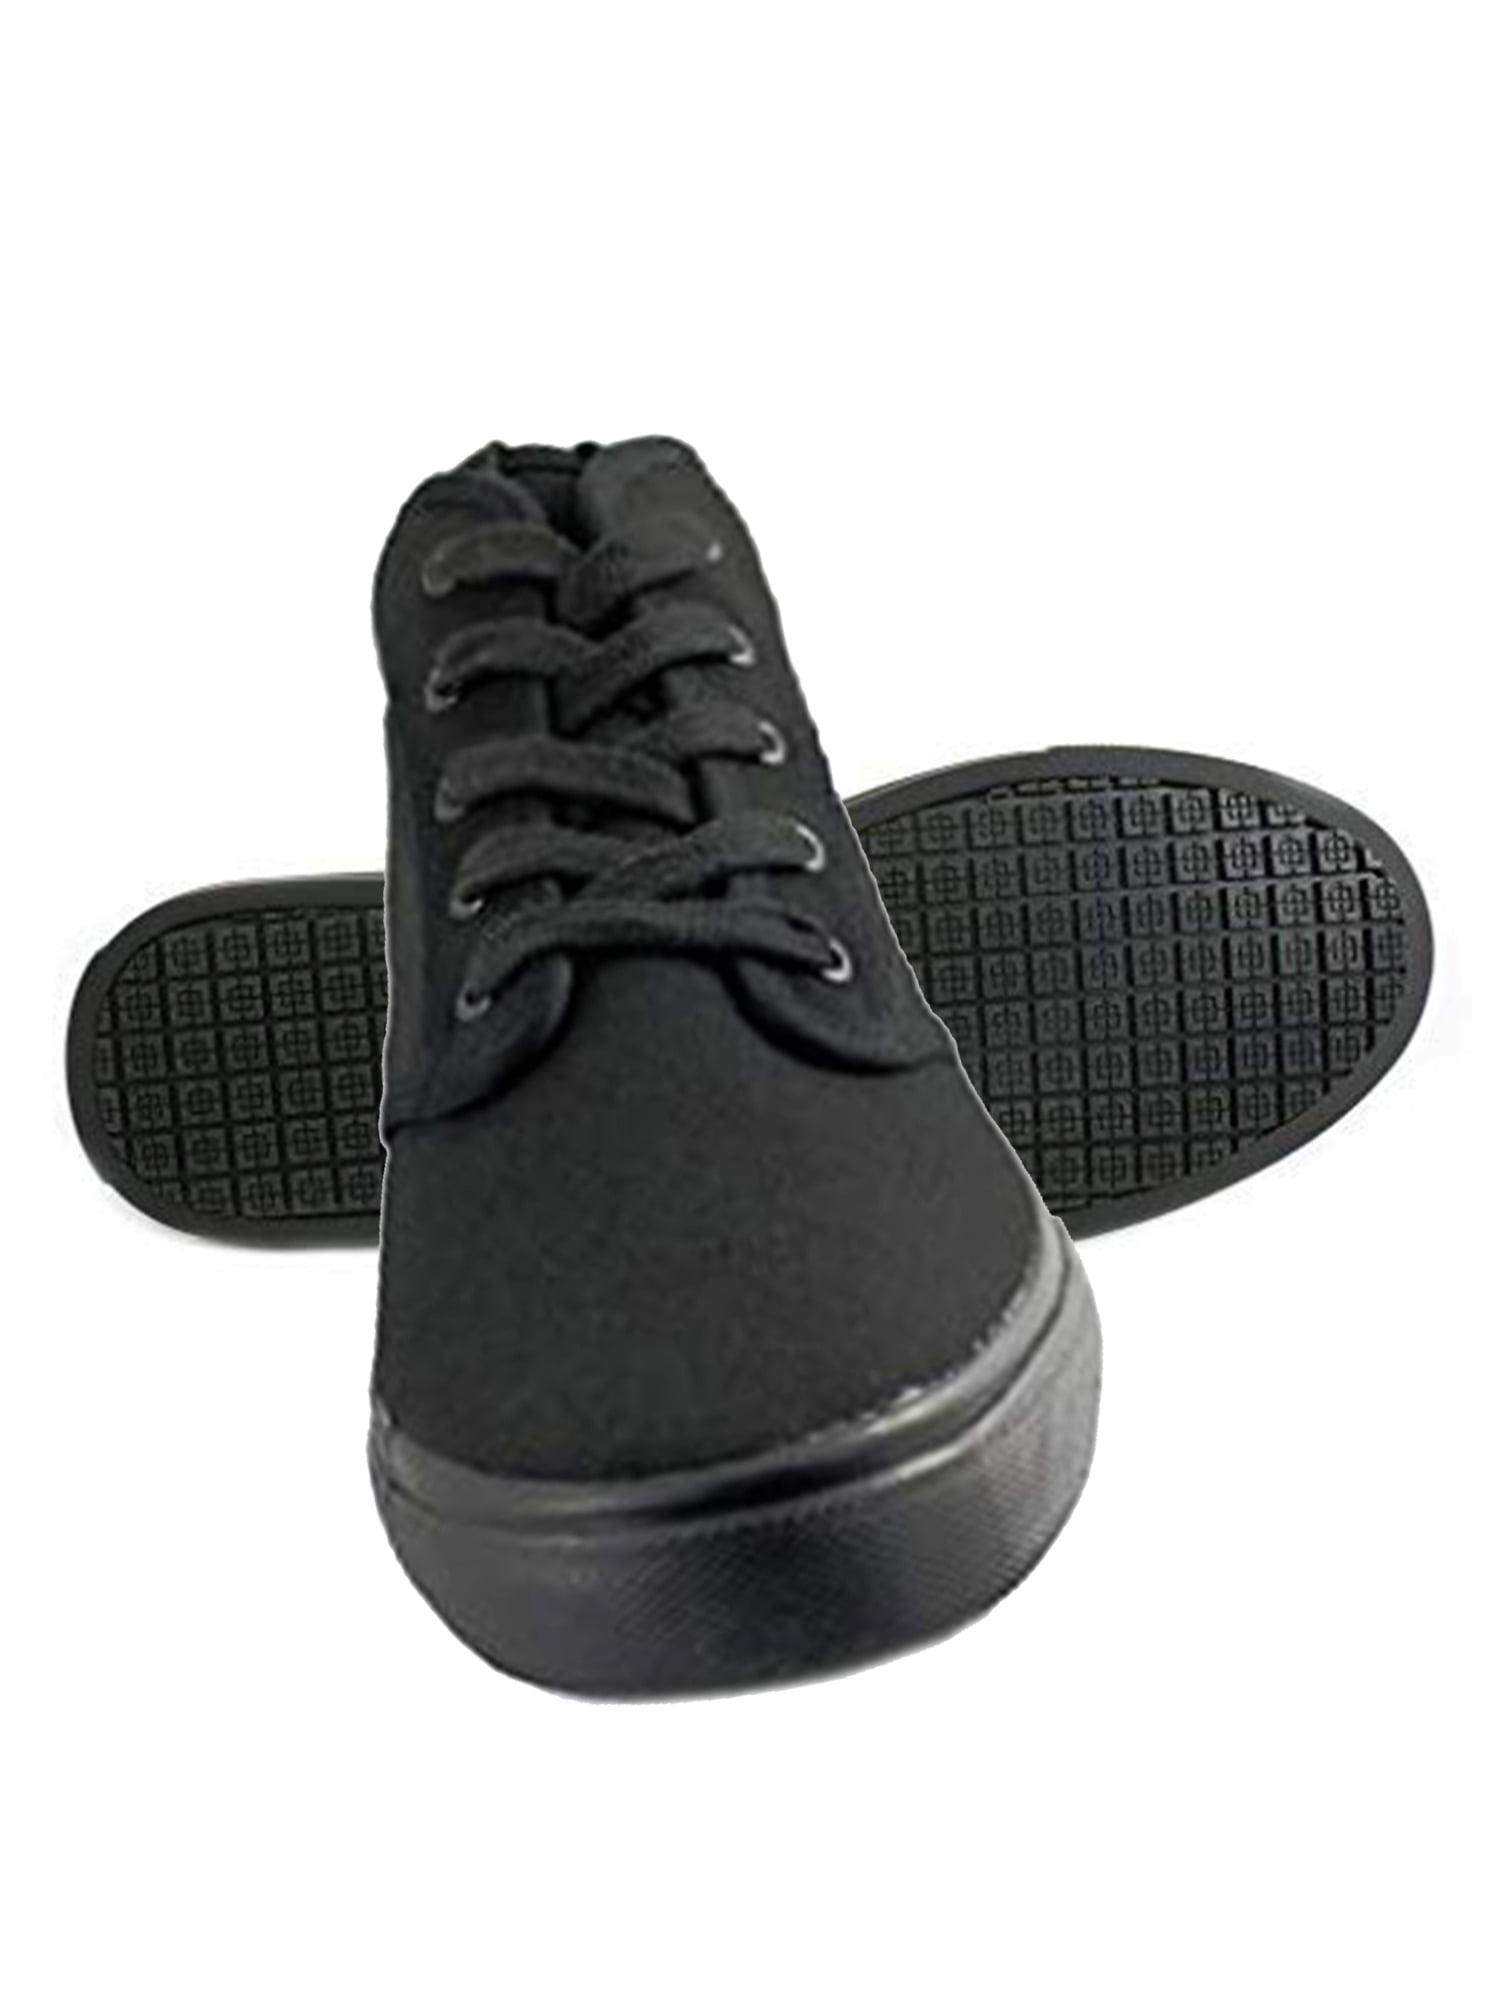 oil water slip resistant shoes